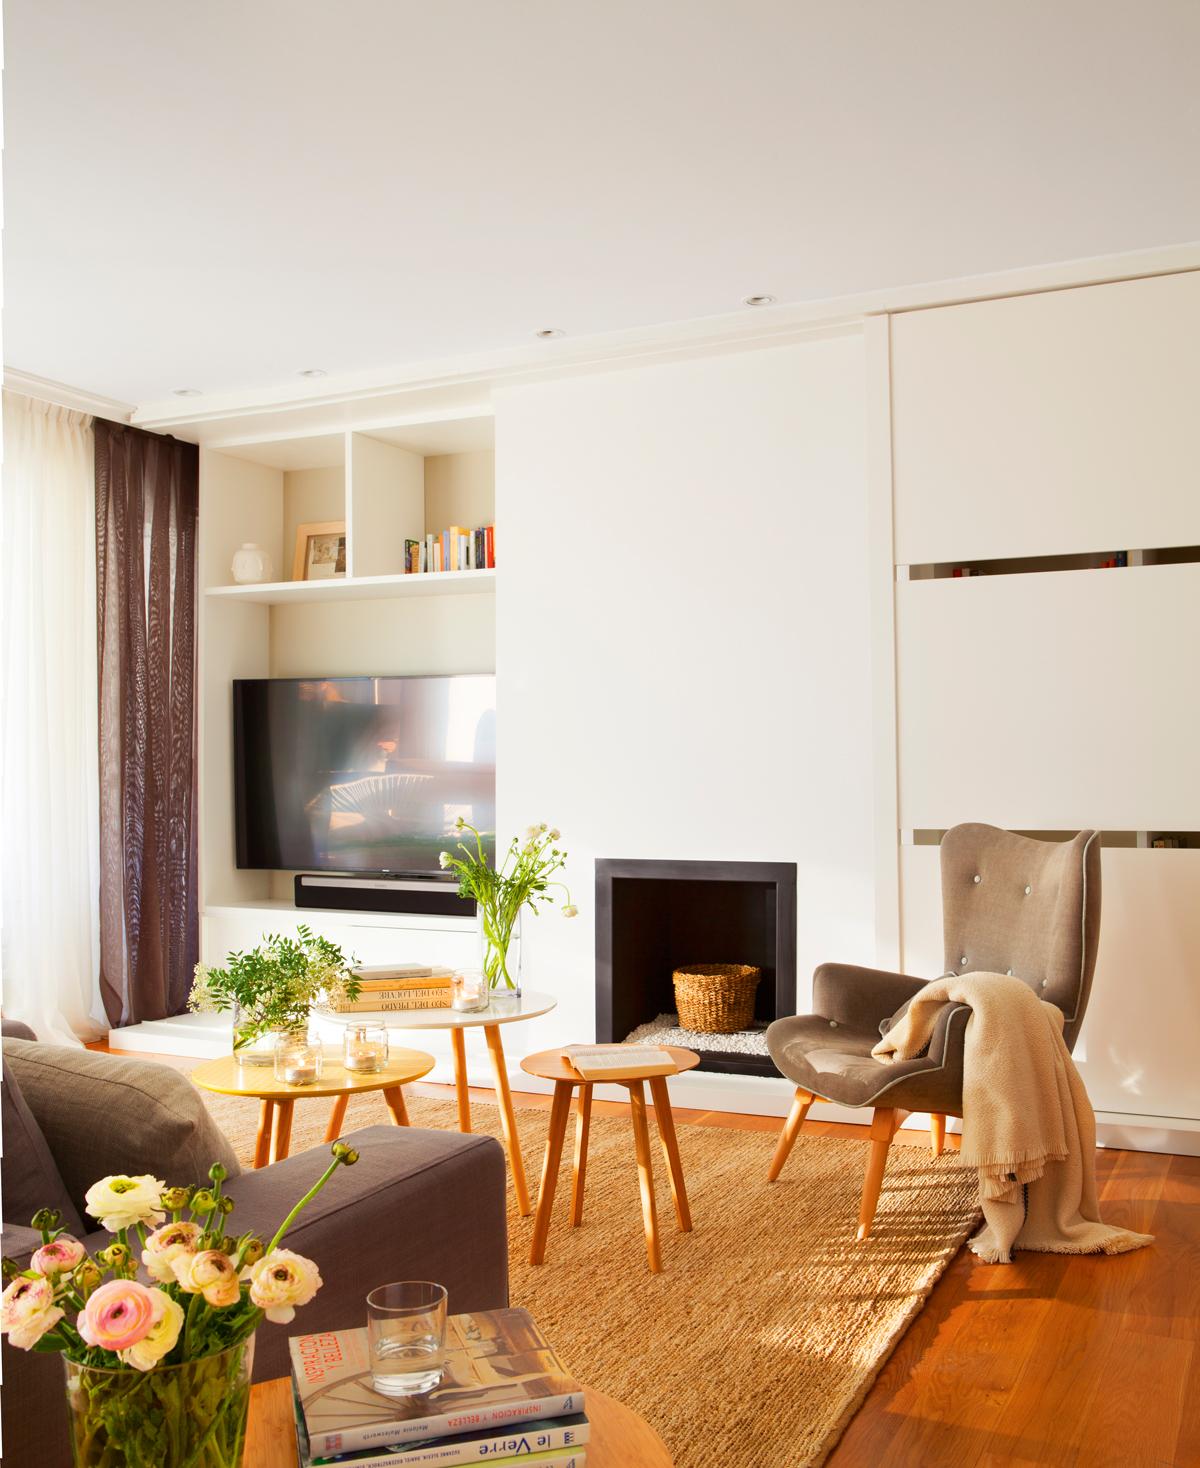 Salones Peque Os Con Muebles Que Aprovechan Cada Cent Metro # Muebles Doble Fondo